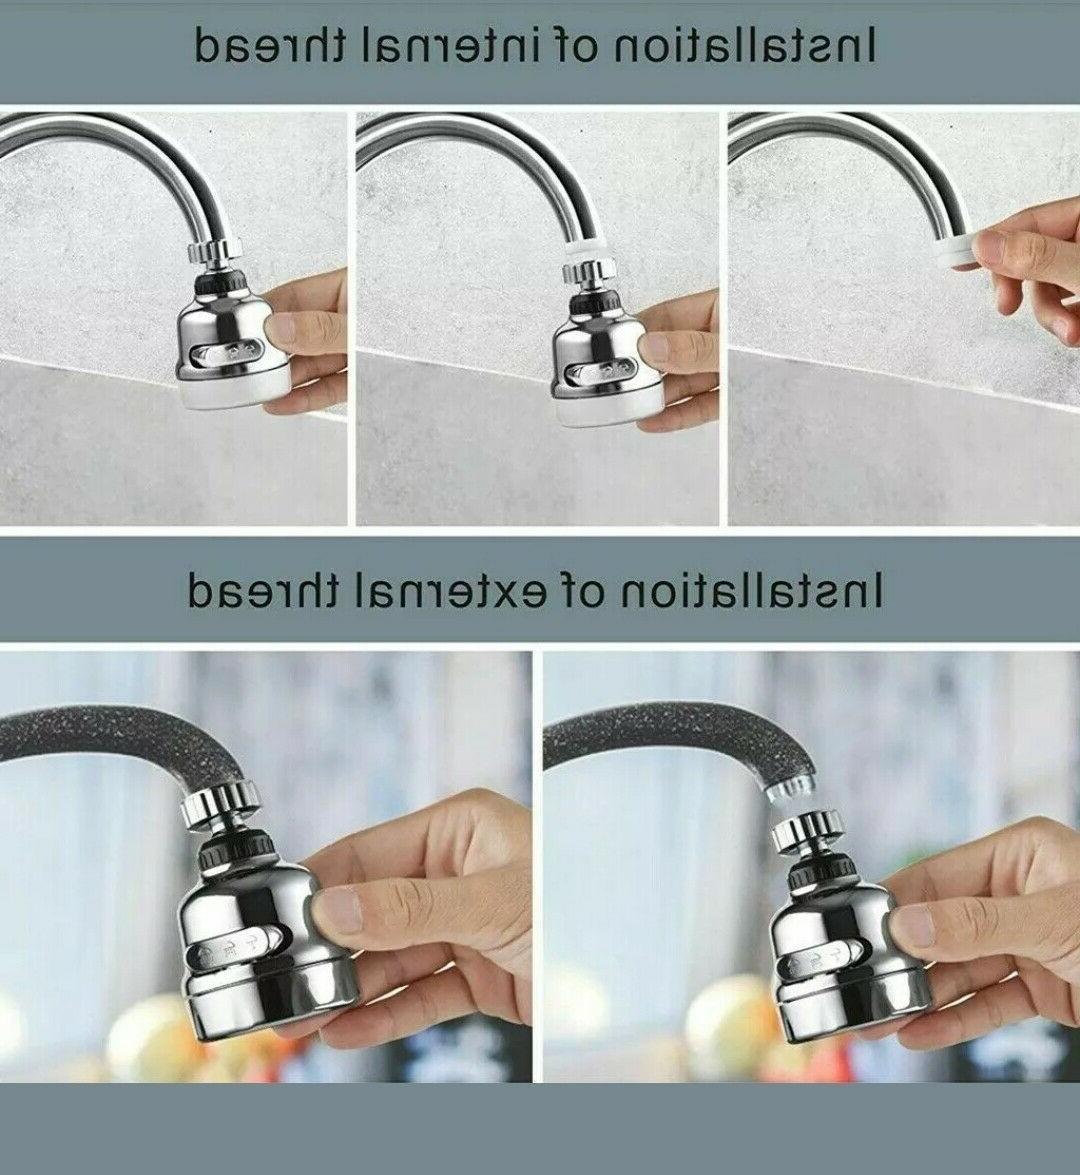 360 Degree Rotating Water